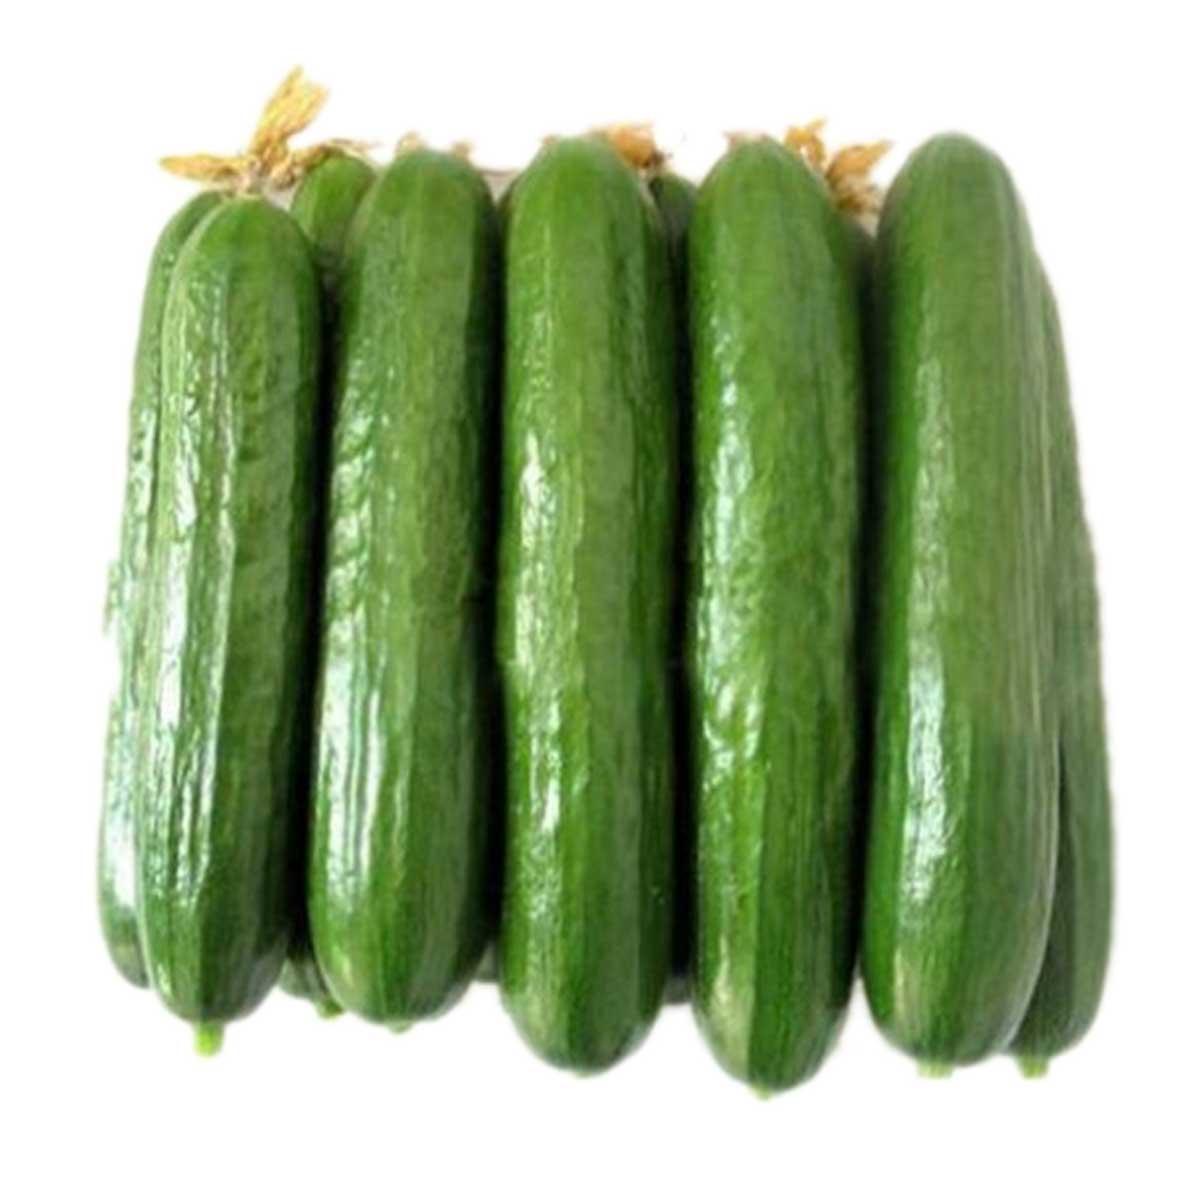 Cucumber Small